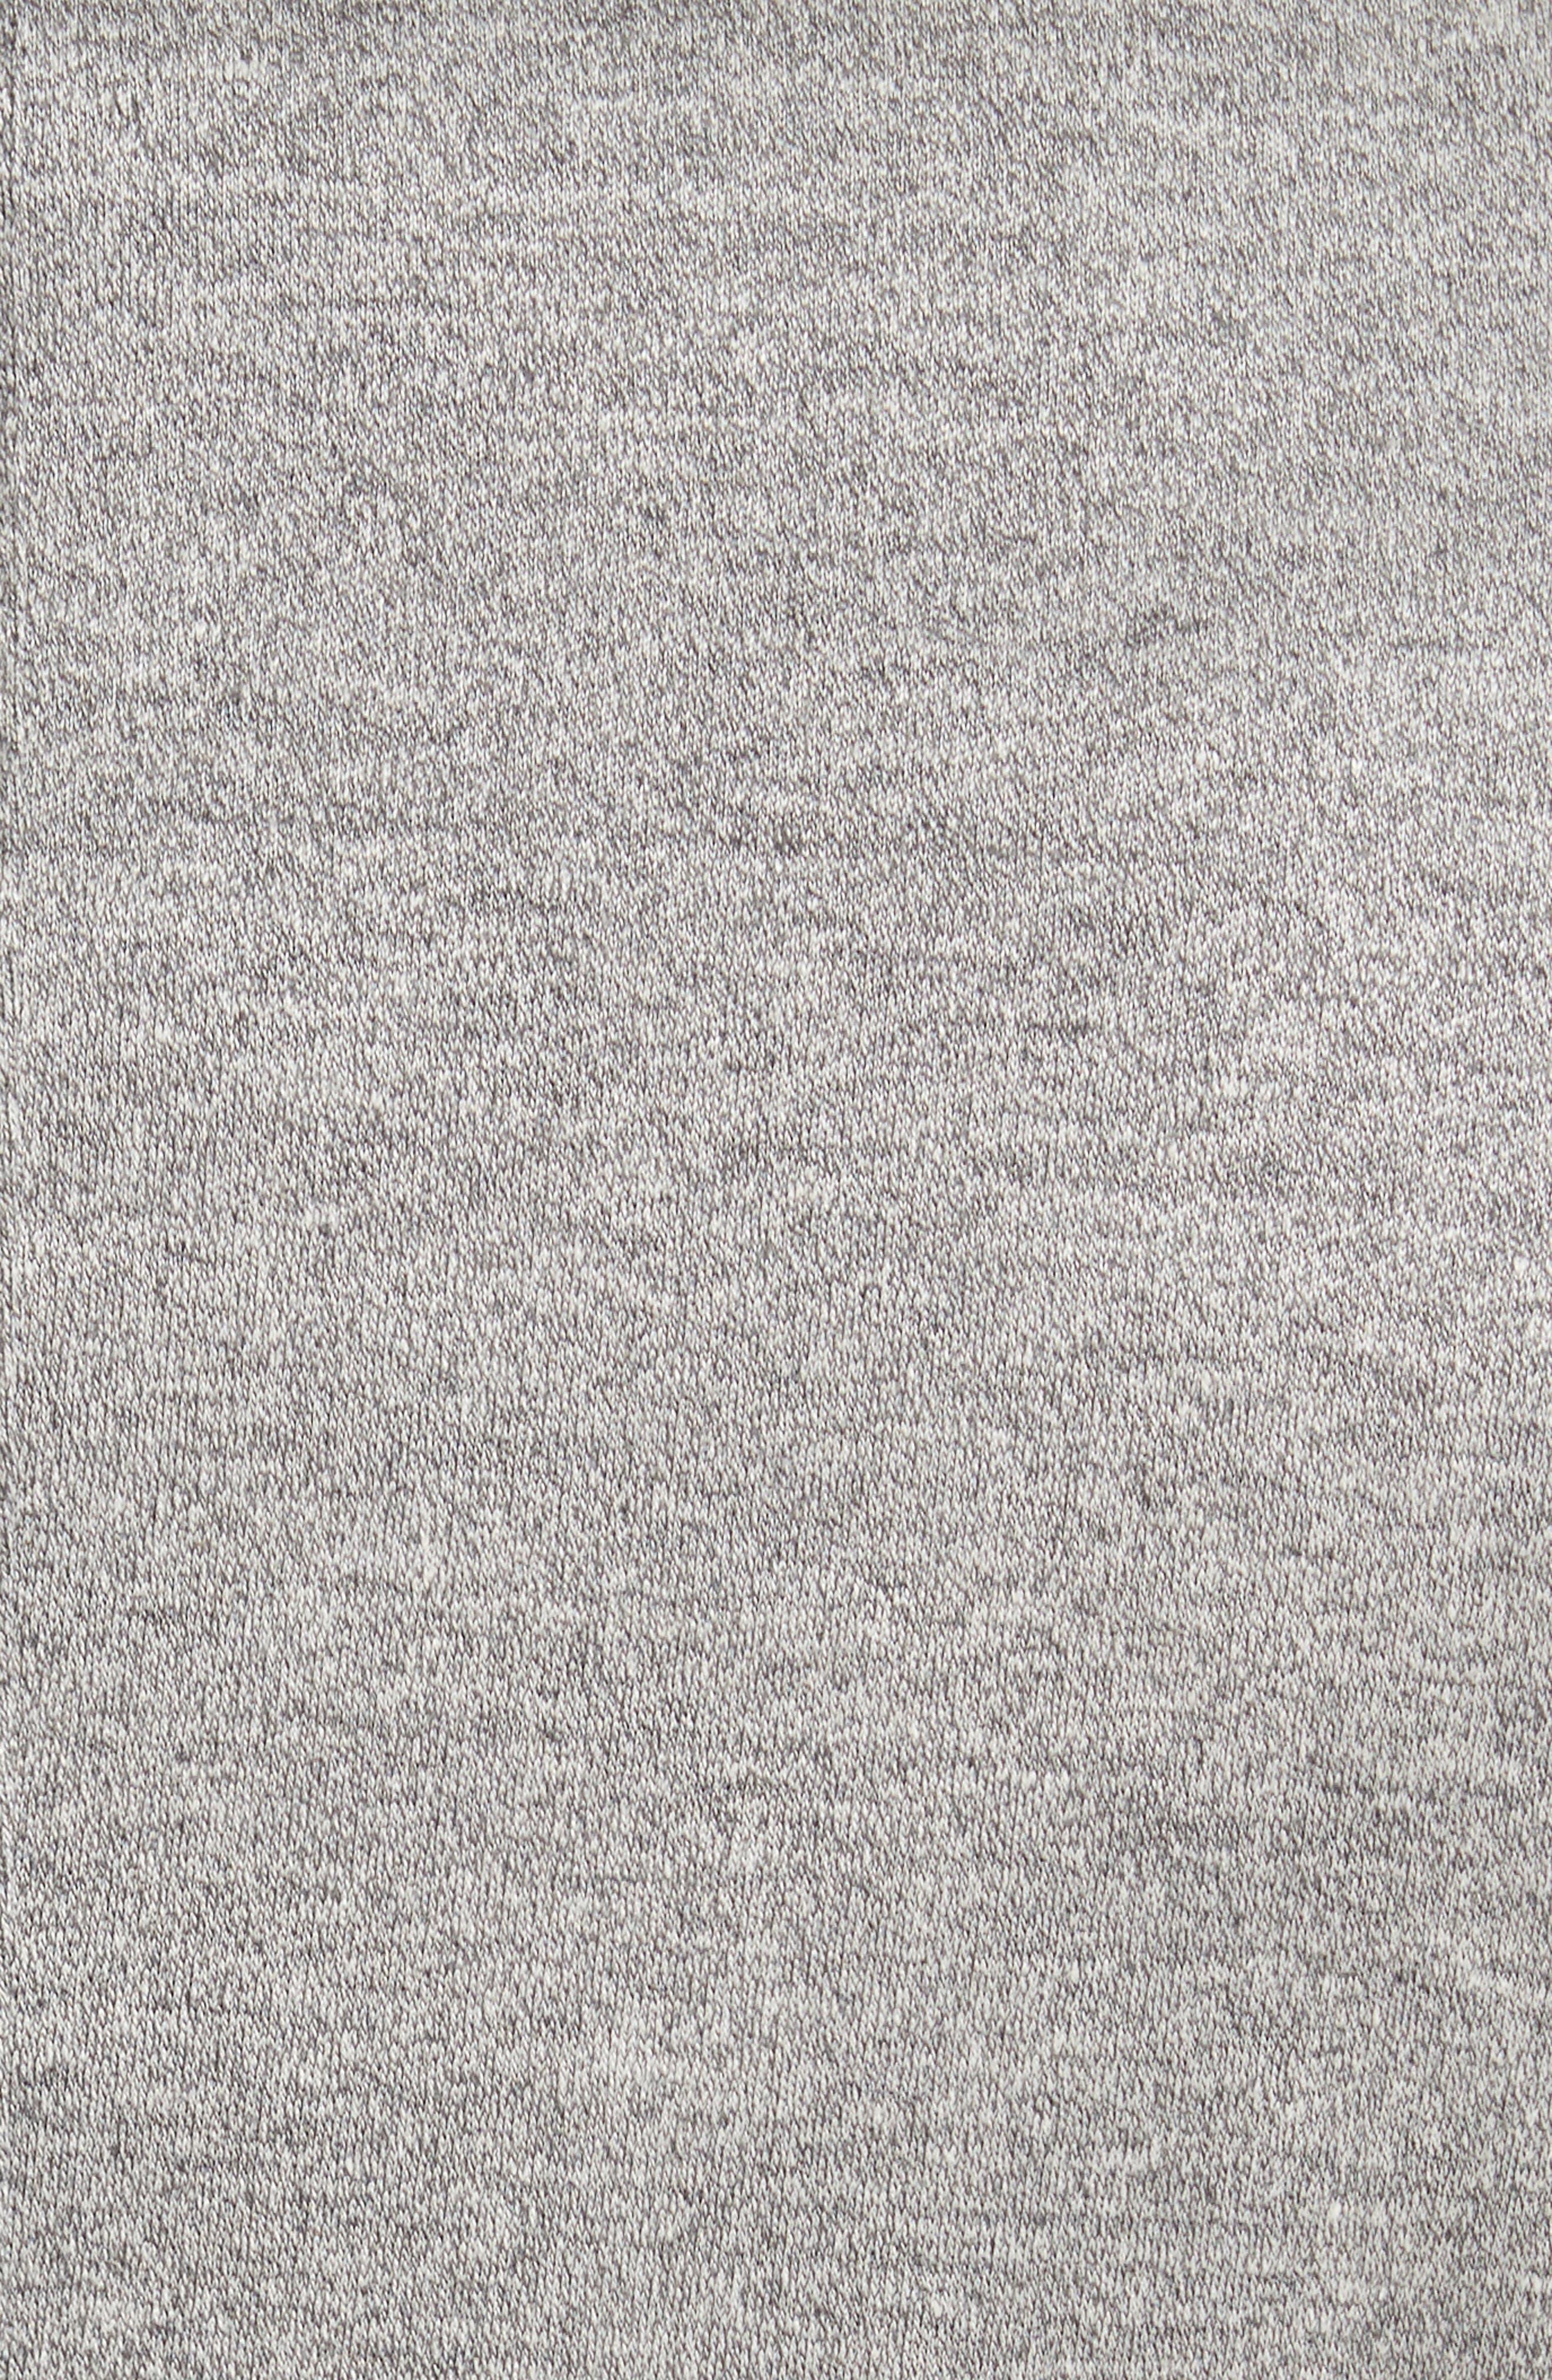 Trim Fit Washed Jersey Jacket,                             Alternate thumbnail 5, color,                             Light Grey